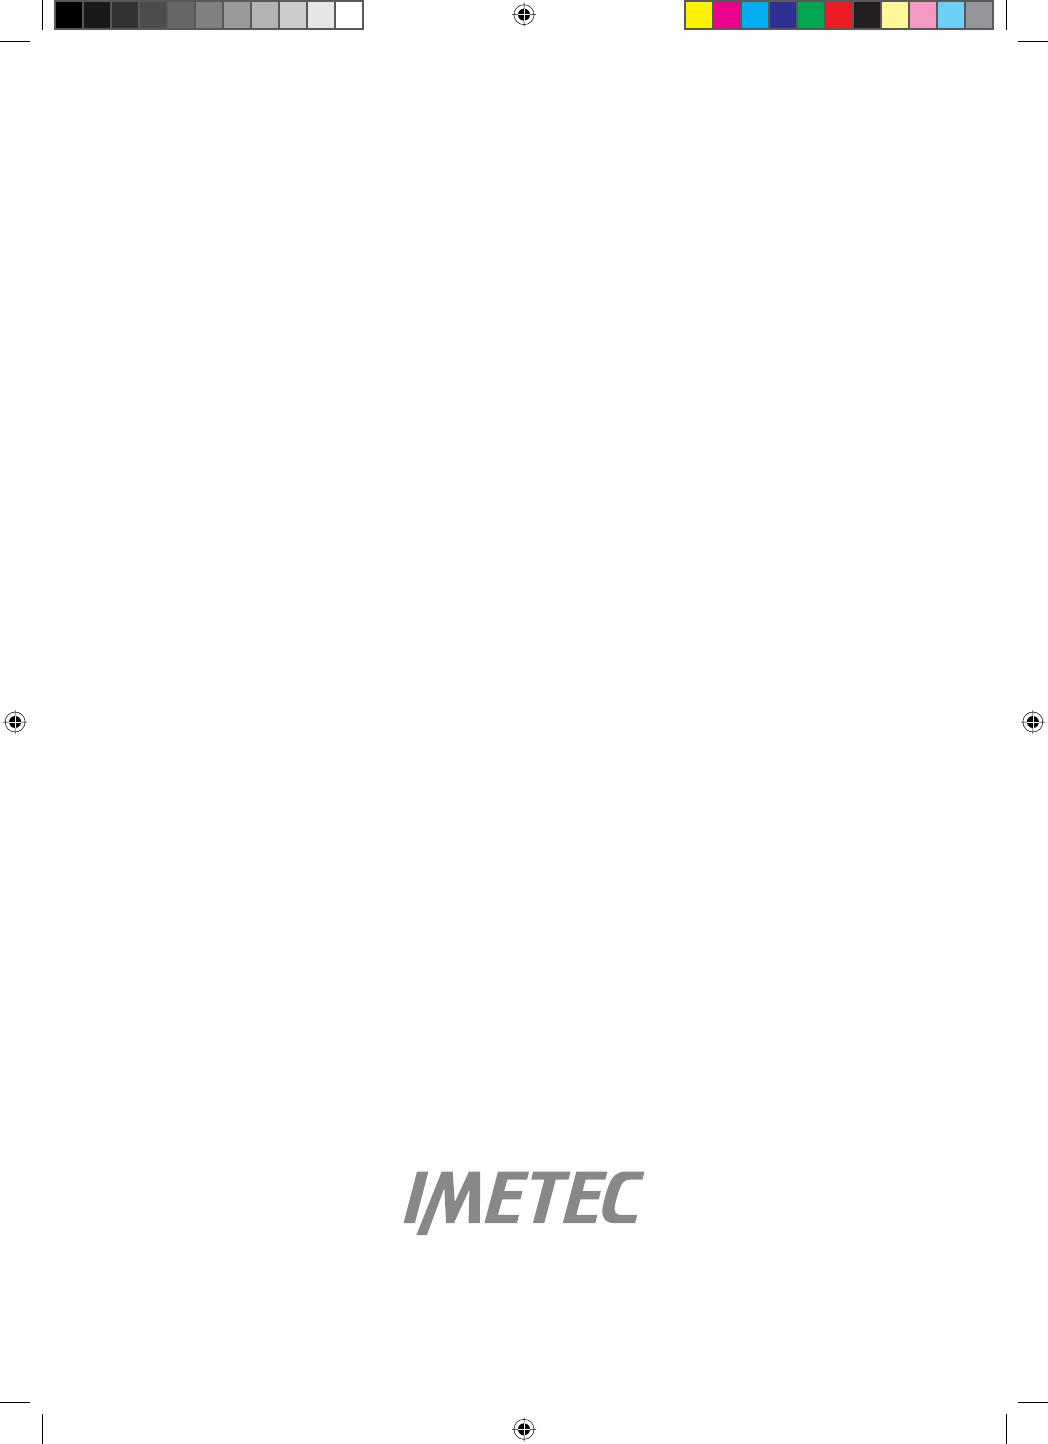 Imetec Sensuij Mc1 200.Manuale Imetec Sensuij Mc2 200 26 Pagine